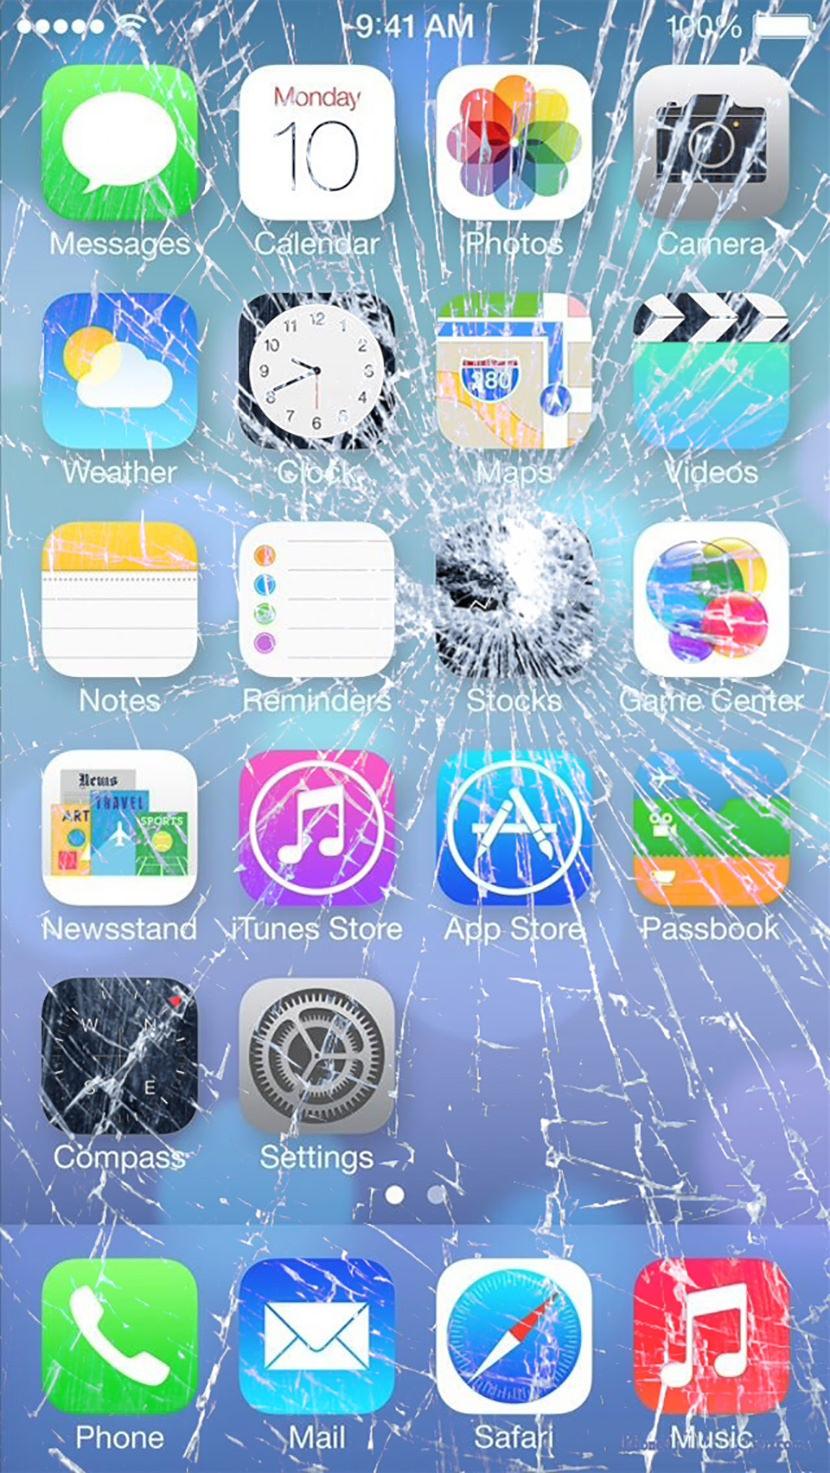 Iphone X Cracked Screen Wallpaper 7 Broken Screen Wallpapers For Apple Iphone 5 6 And 7